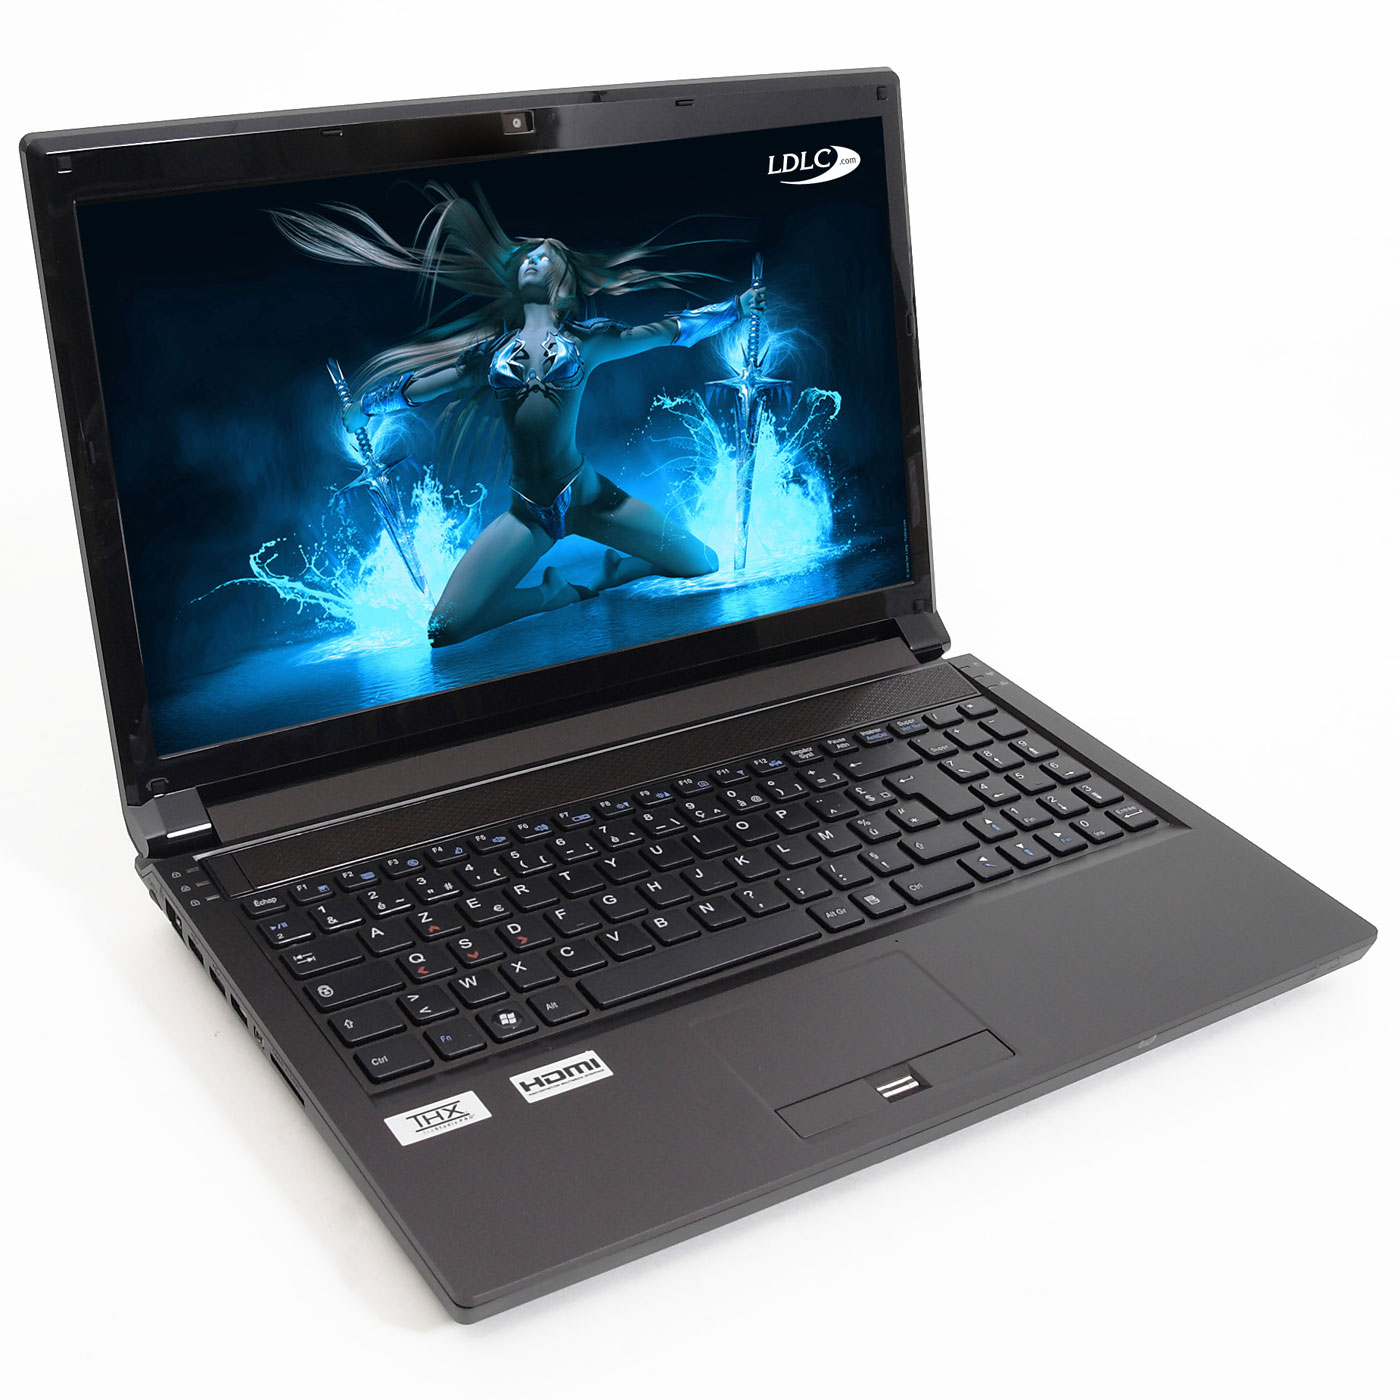 "PC portable LDLC Bellone GA1-I5-4-H5+ Intel Core i5-2410M 4 Go 500 Go 15.6"" LED NVIDIA GeForce GTX 560M Graveur DVD Wi-Fi N/Bluetooth Webcam (sans OS)"